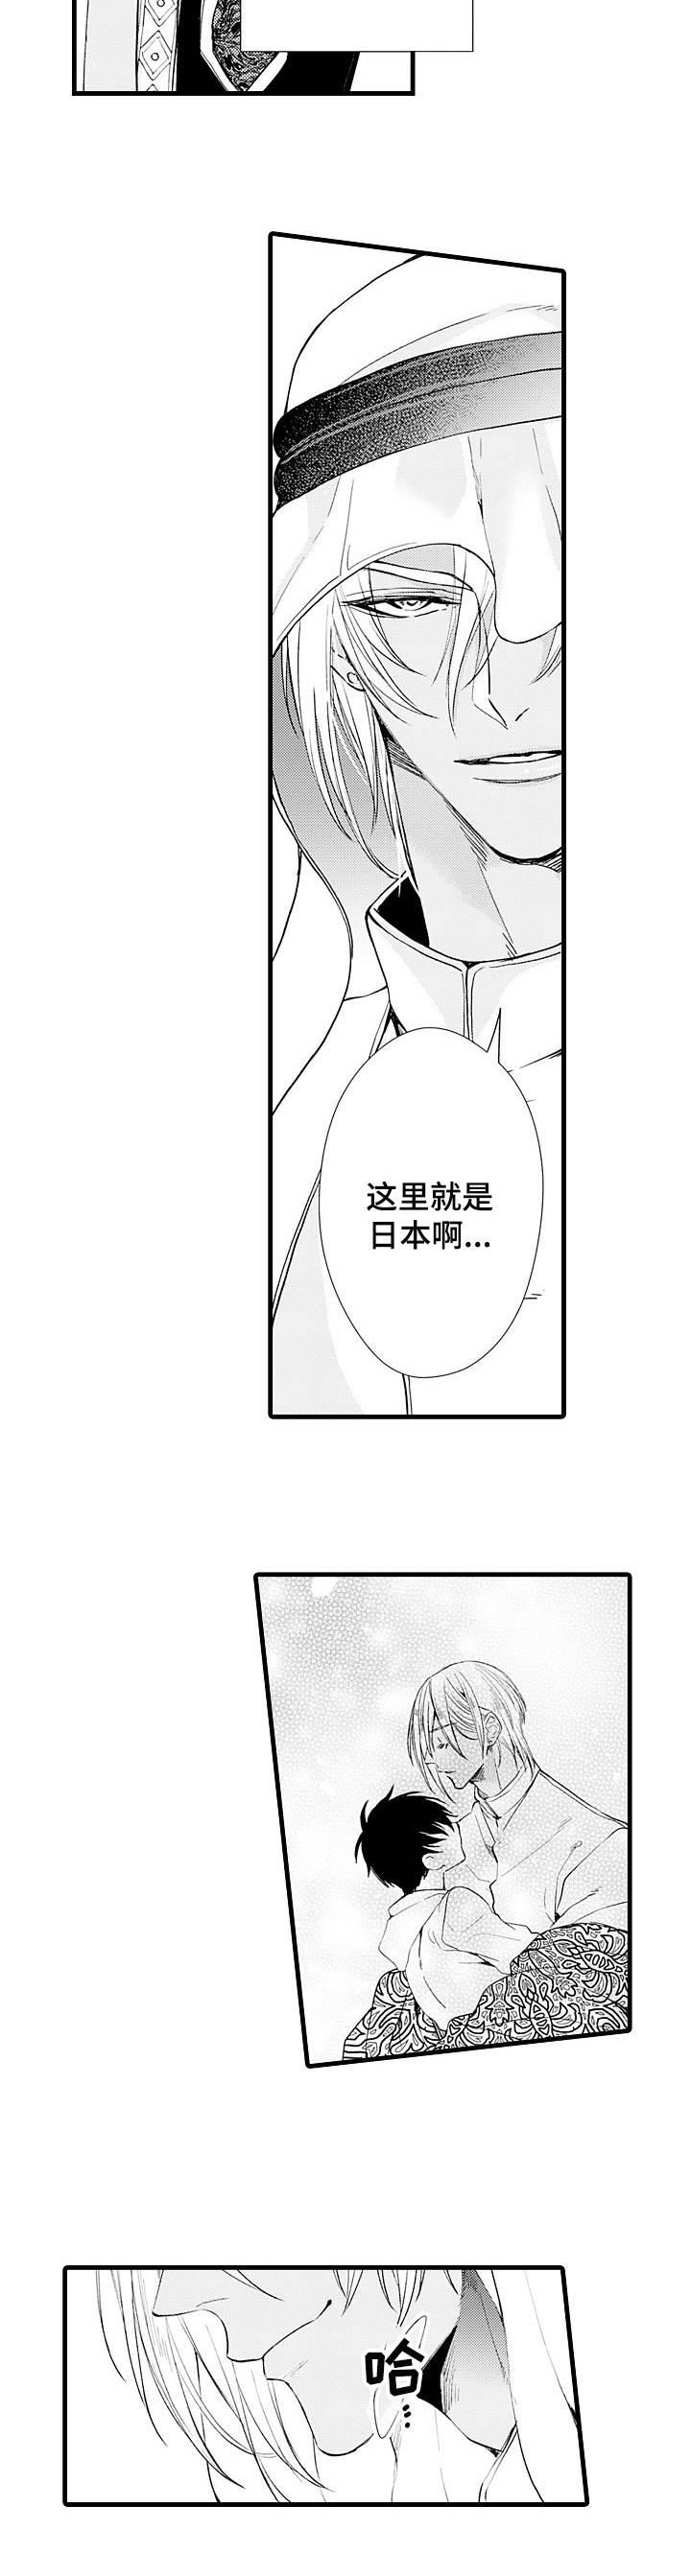 A与A的对决-漫画韩国免费全集完整版BL纯爱连载首发-啵乐漫画